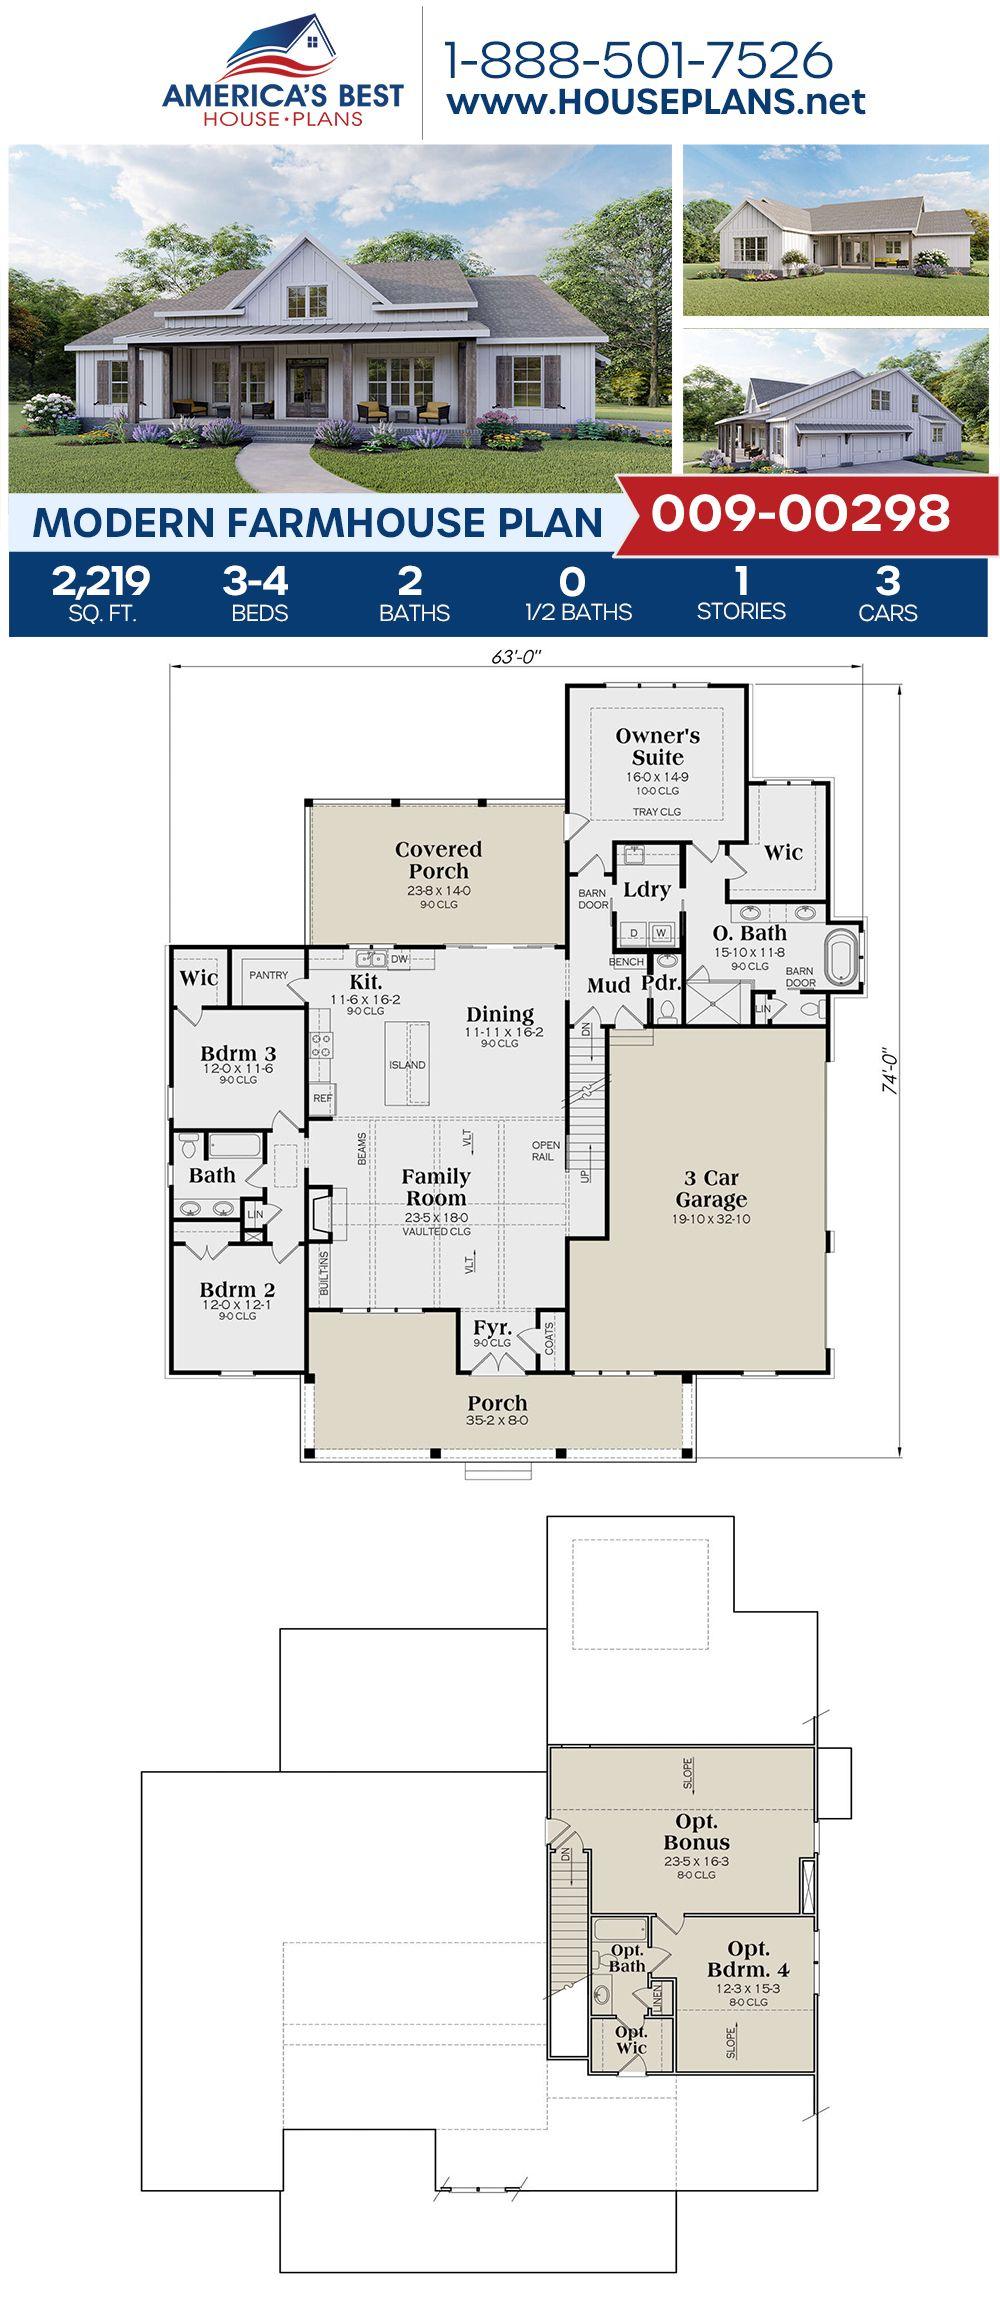 House Plan 009 00298 Modern Farmhouse Plan 2 219 Square Feet 3 4 Bedrooms 2 5 Bathrooms Modern Farmhouse Plans Farmhouse Floor Plans Porch House Plans